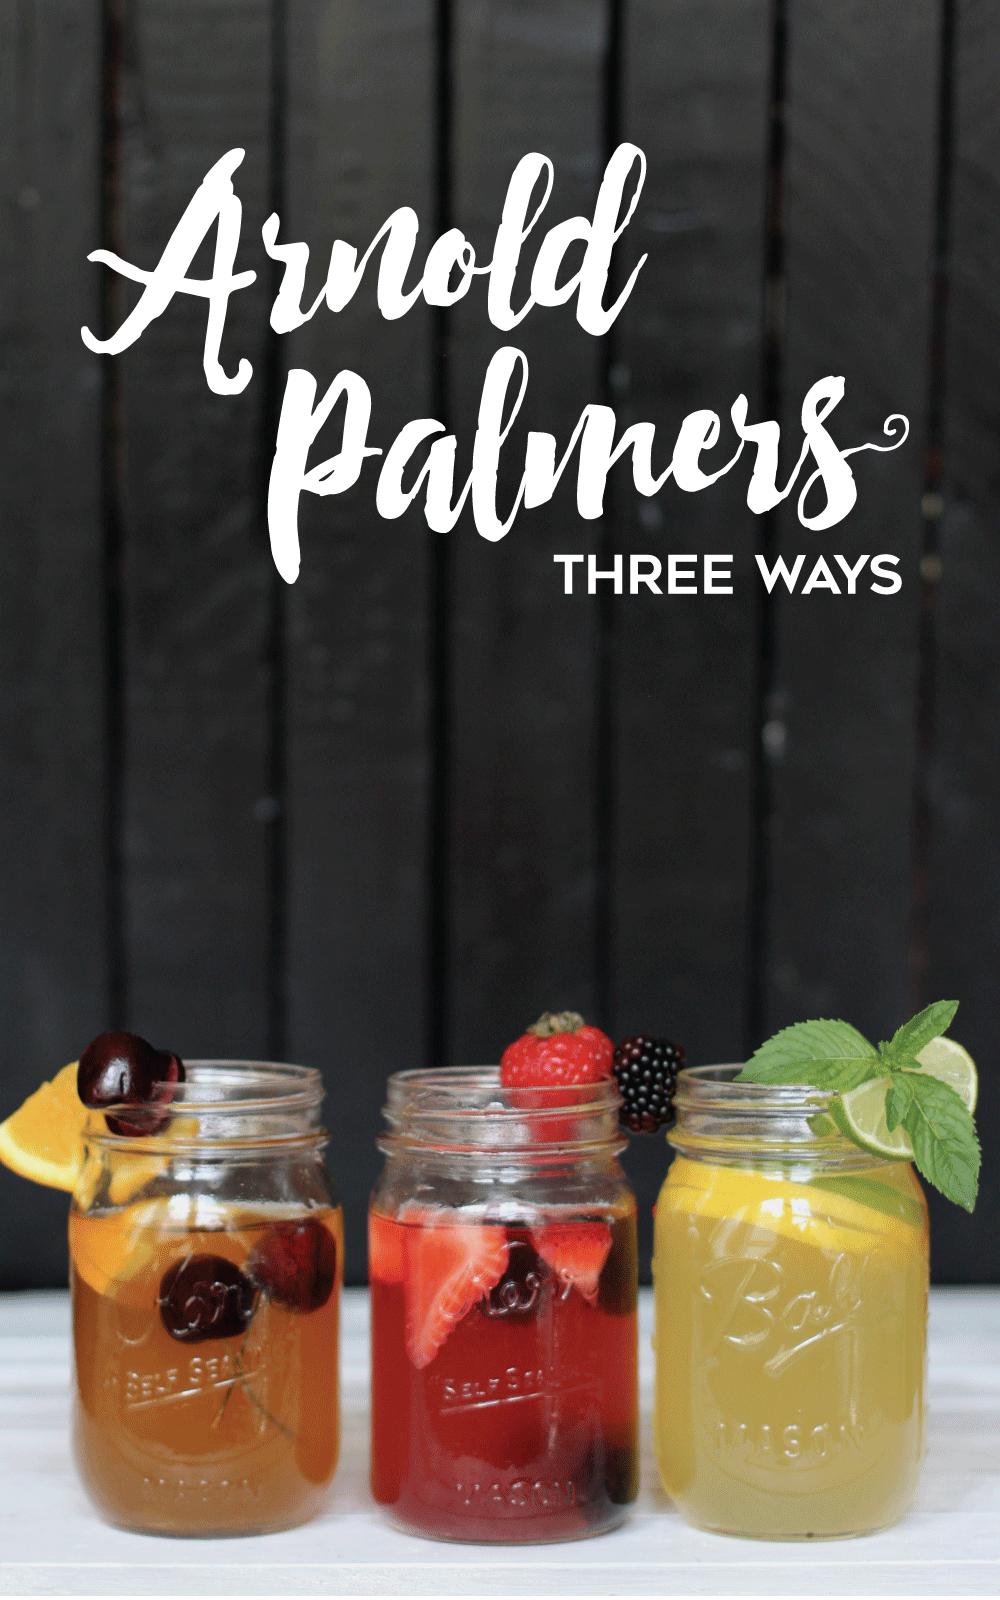 Arnold Palmers, Three Ways